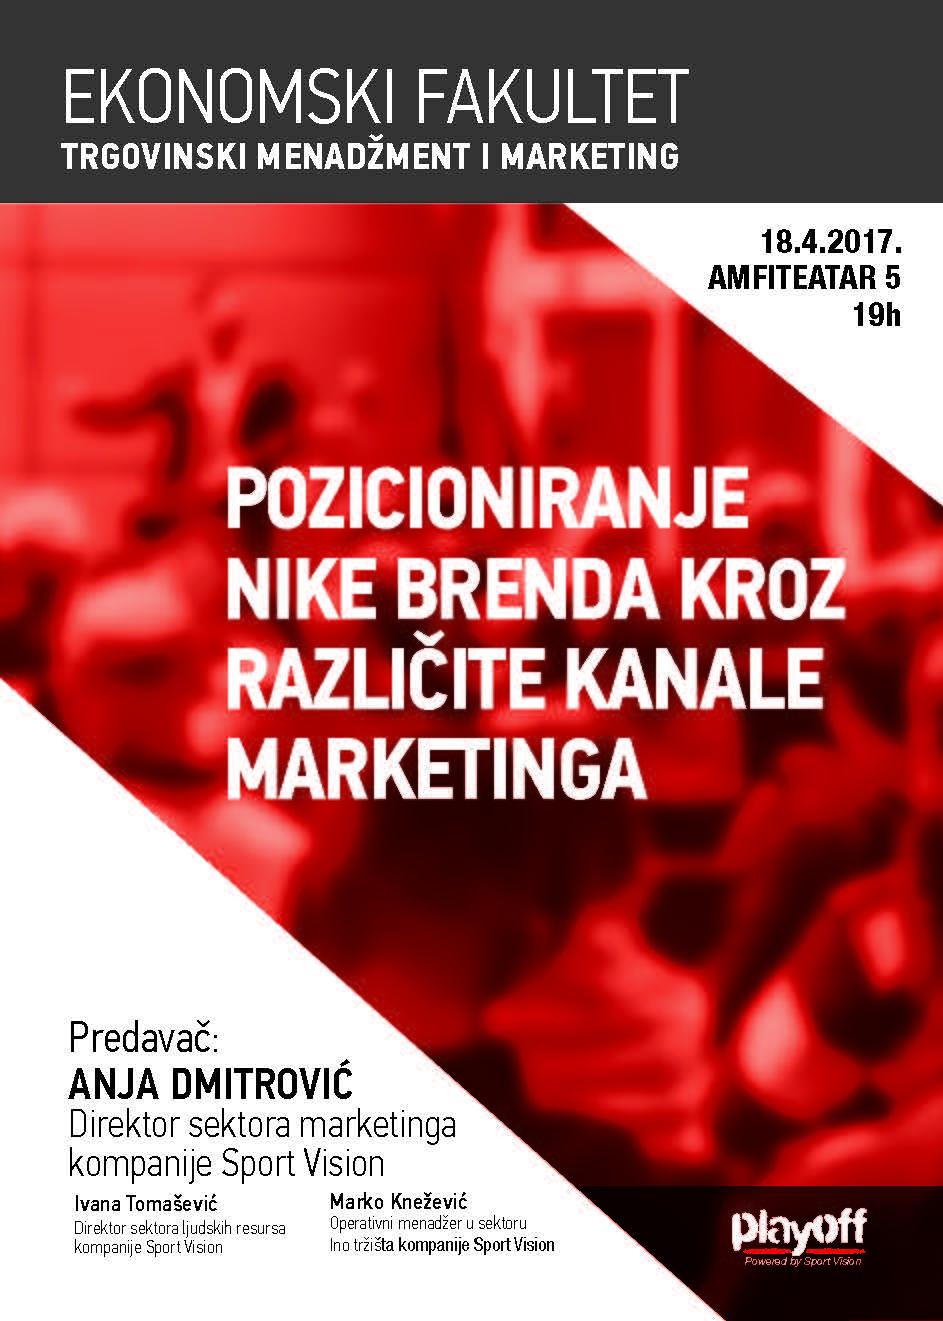 EKOF VELIKO PREDAVANJE - A3+5mm bleed!